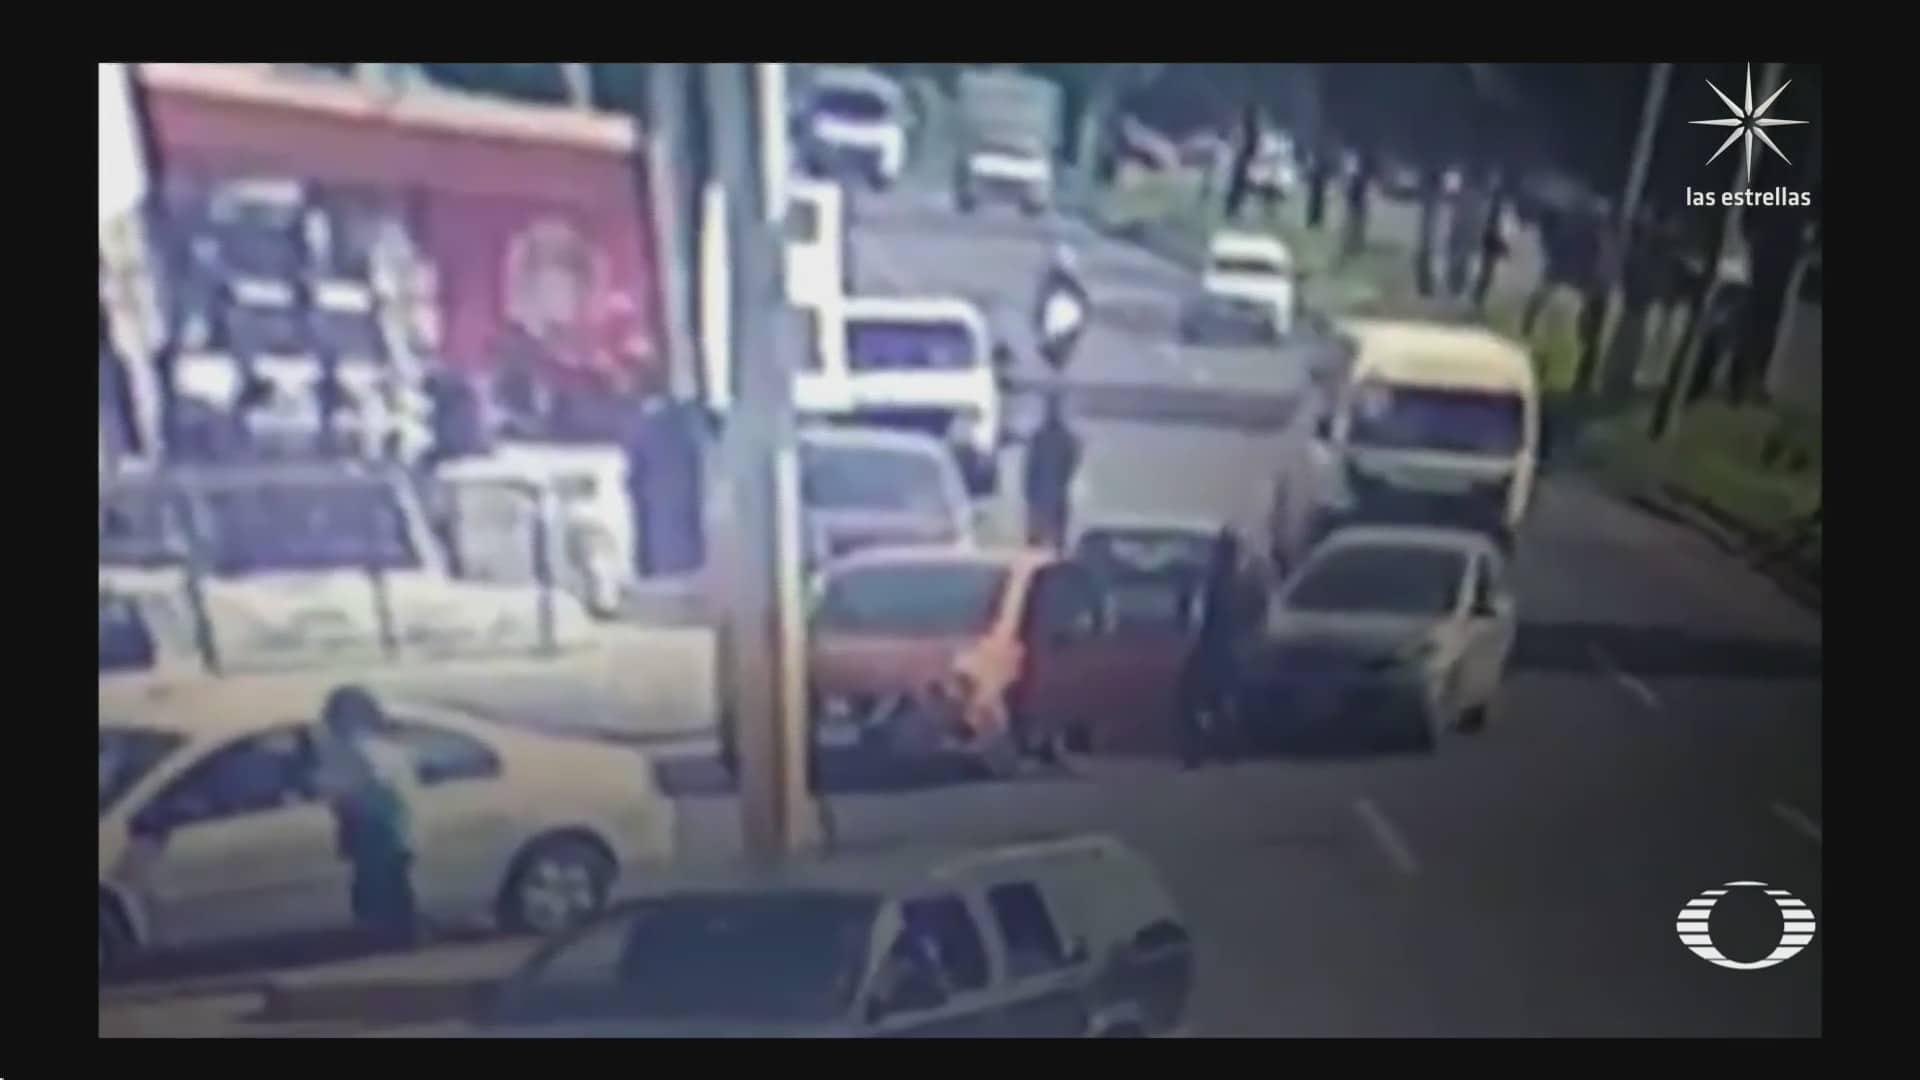 desconocidos se unen para detener a asaltante en ecatepec